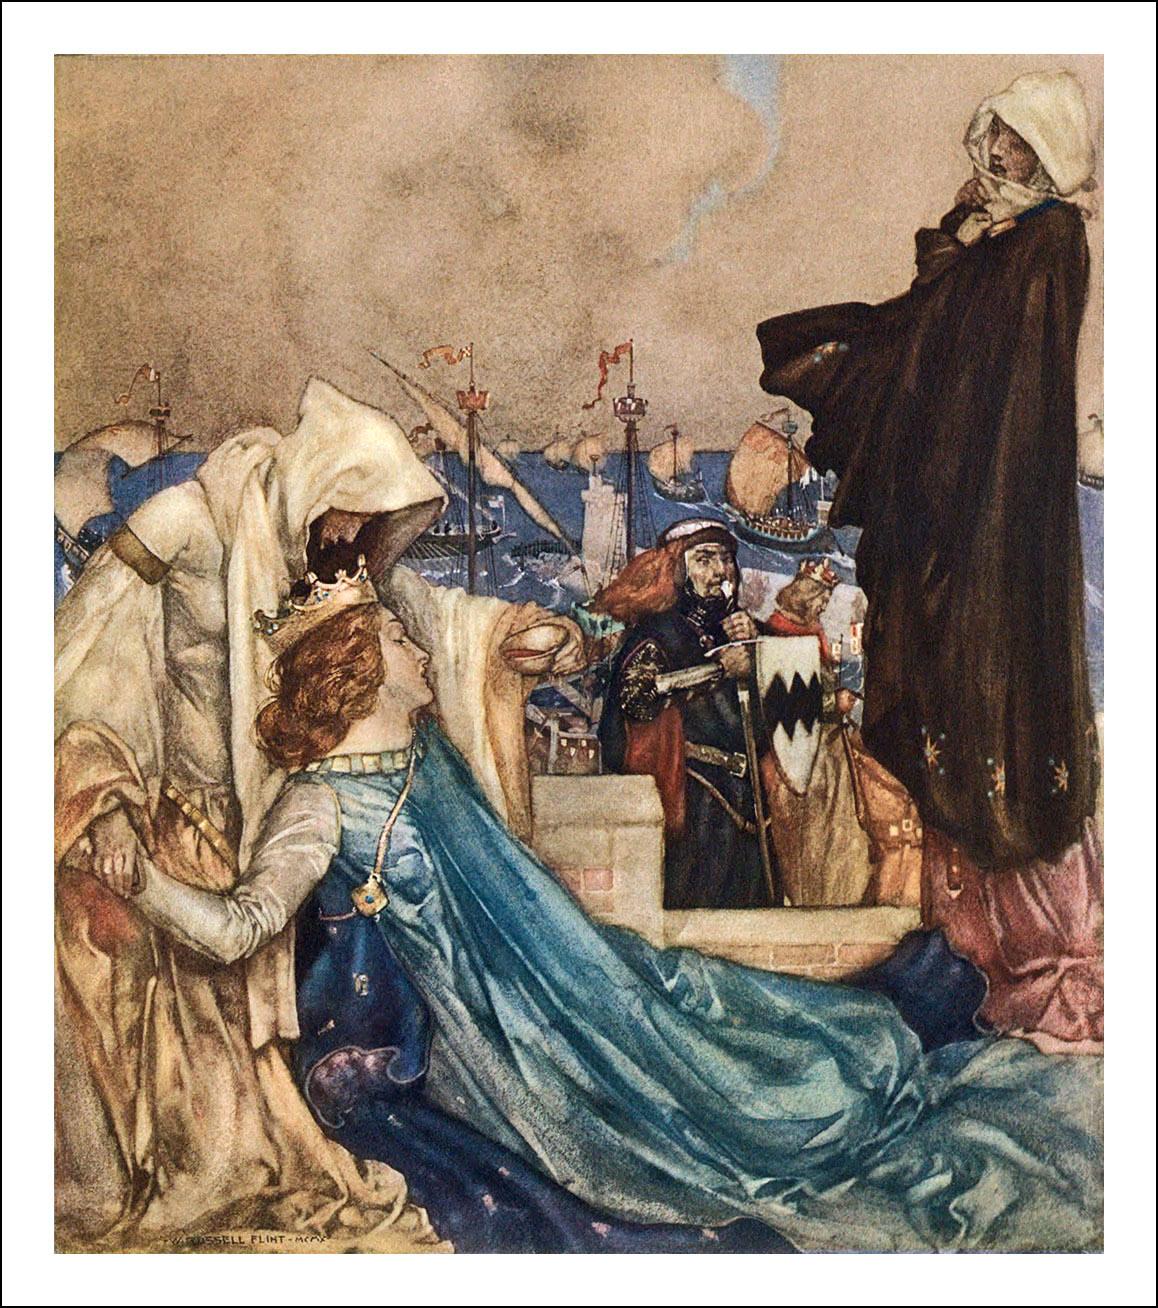 Thomas Malory's 'Le Morte Darthur'